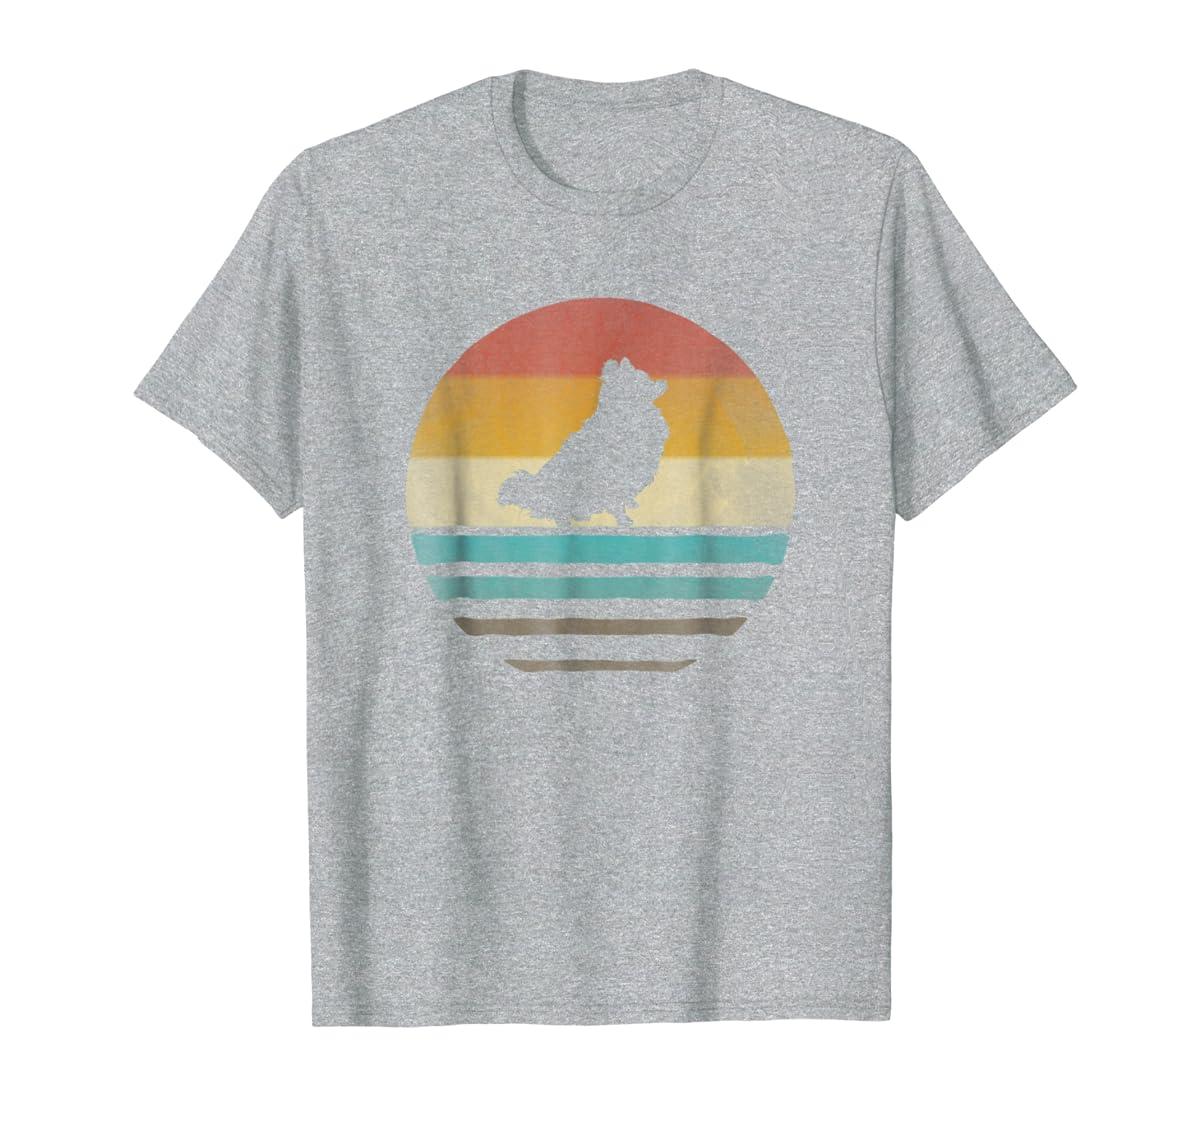 Pomeranian Dog Shirt Retro Vintage 70s Silhouette Distressed-Men's T-Shirt-Sport Grey